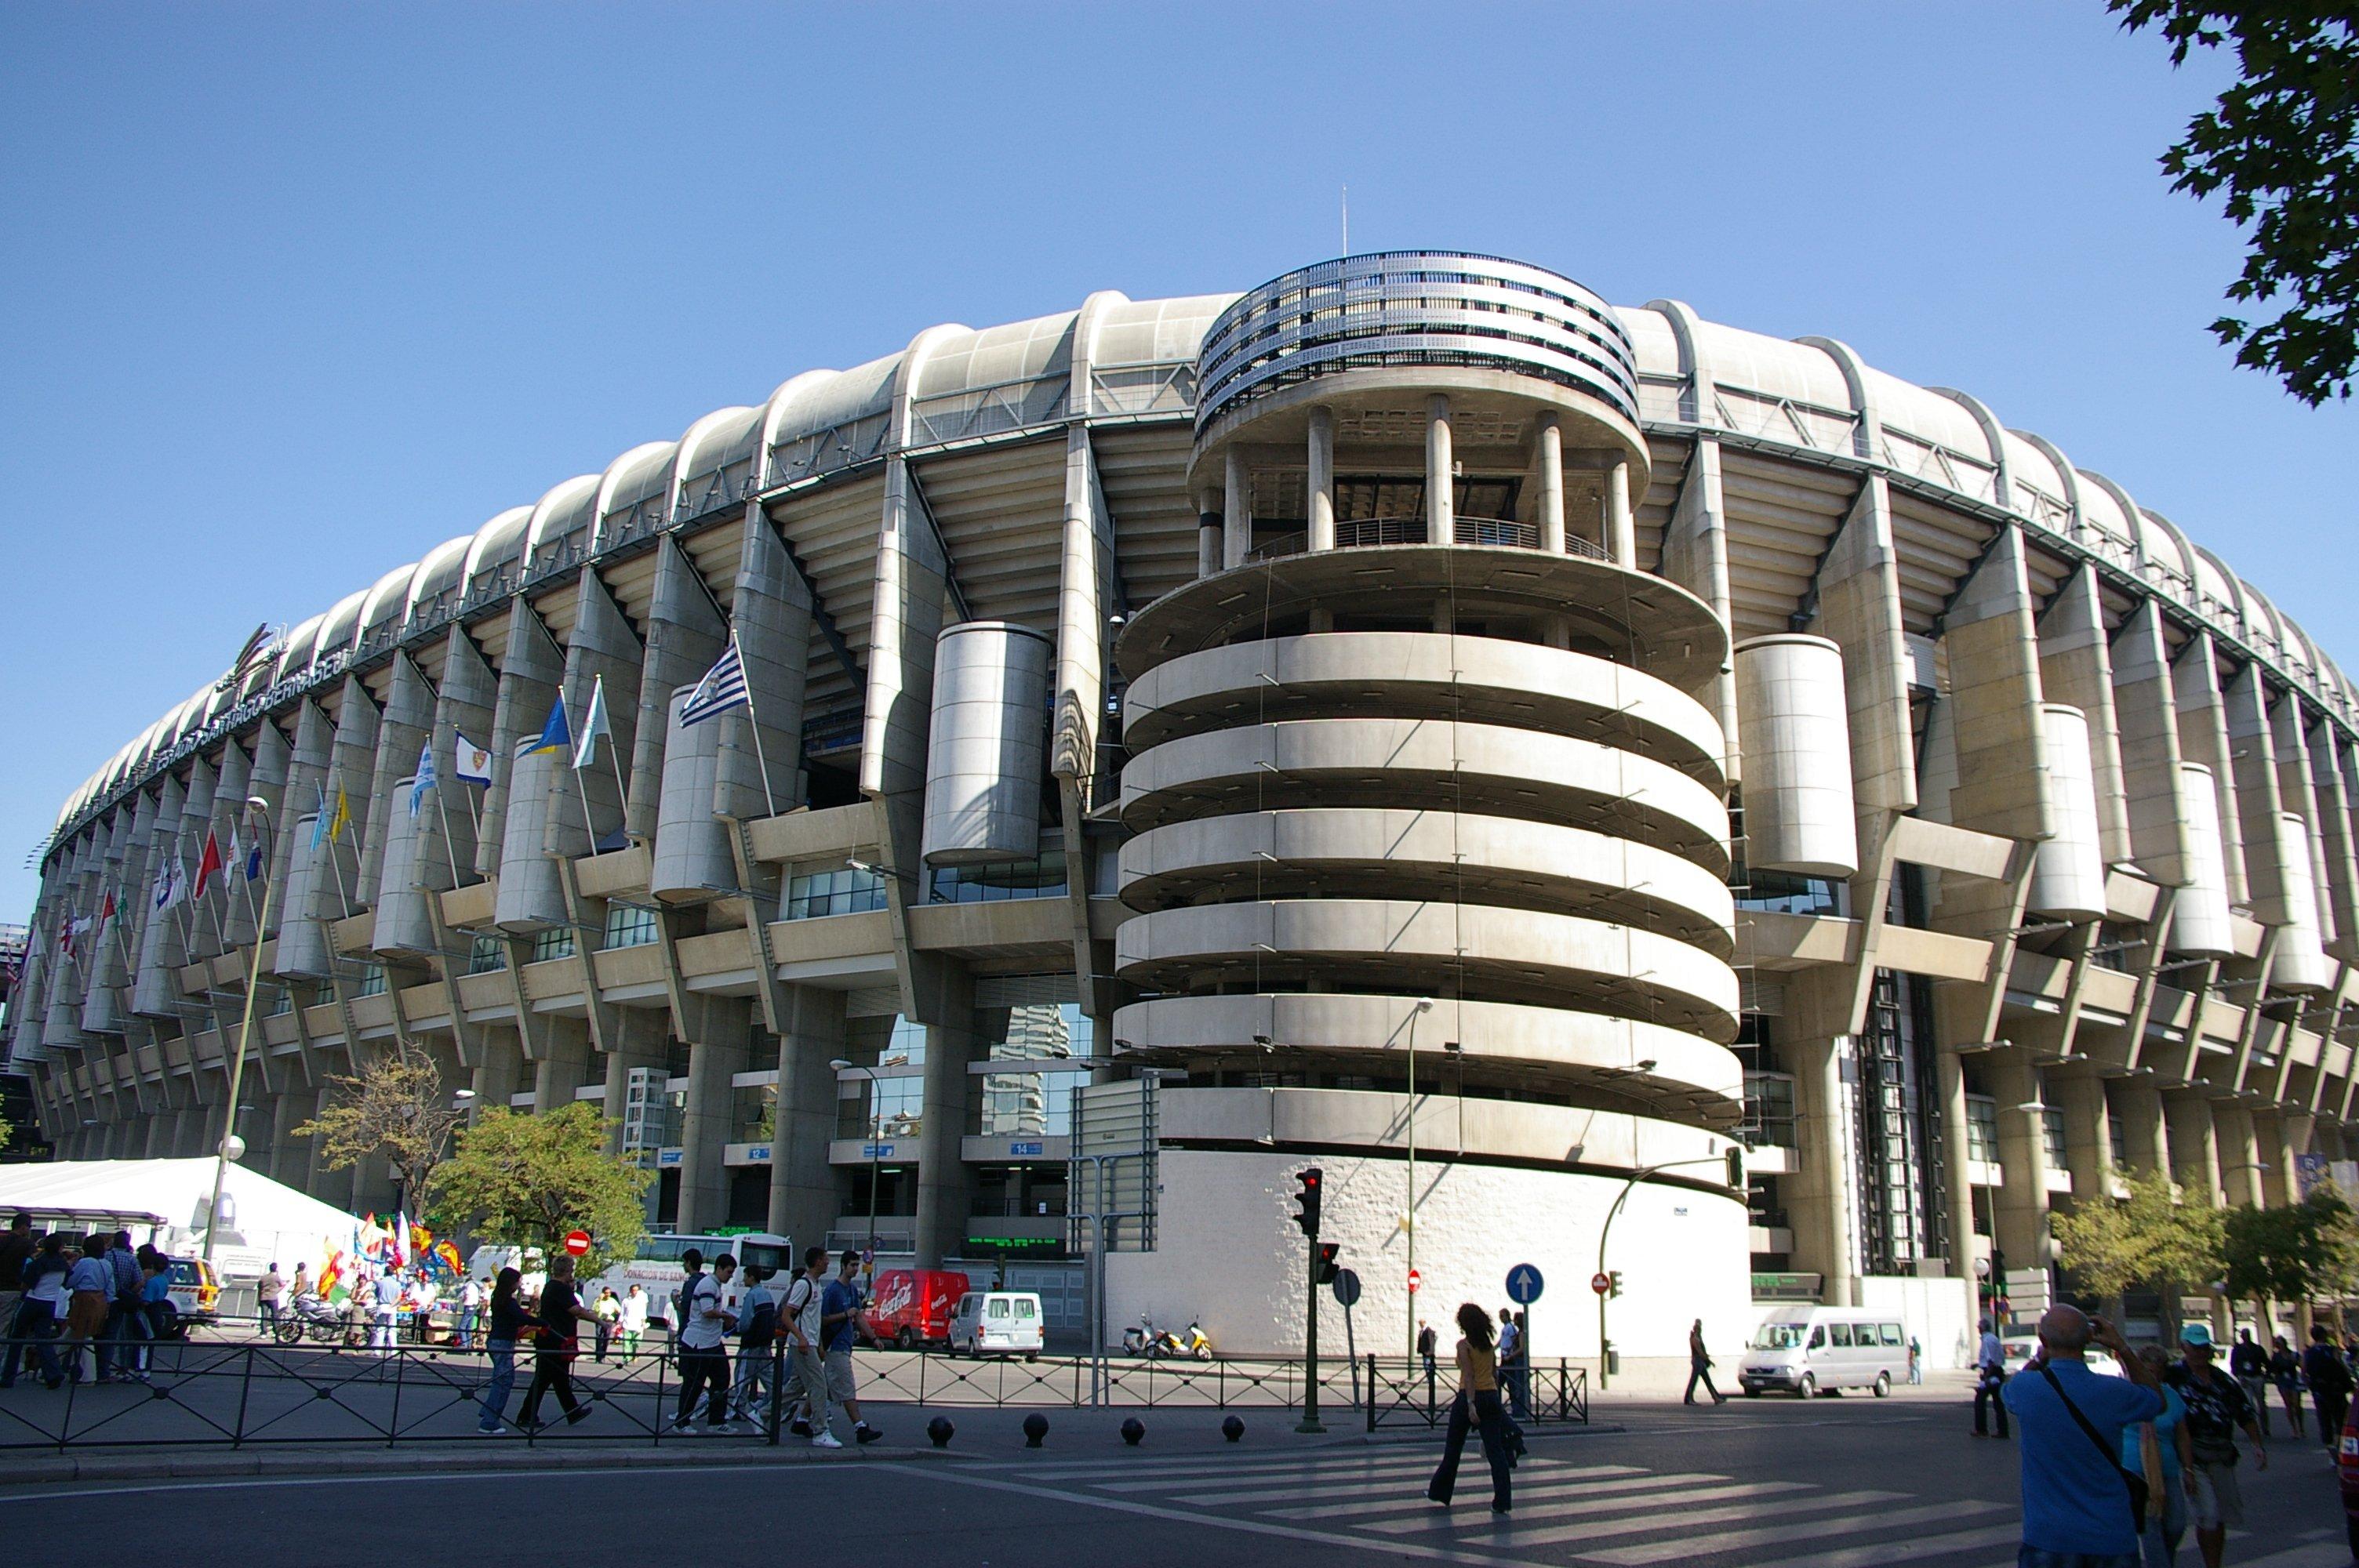 World soccer santiago bernabeu stadium for Puerta 53 santiago bernabeu